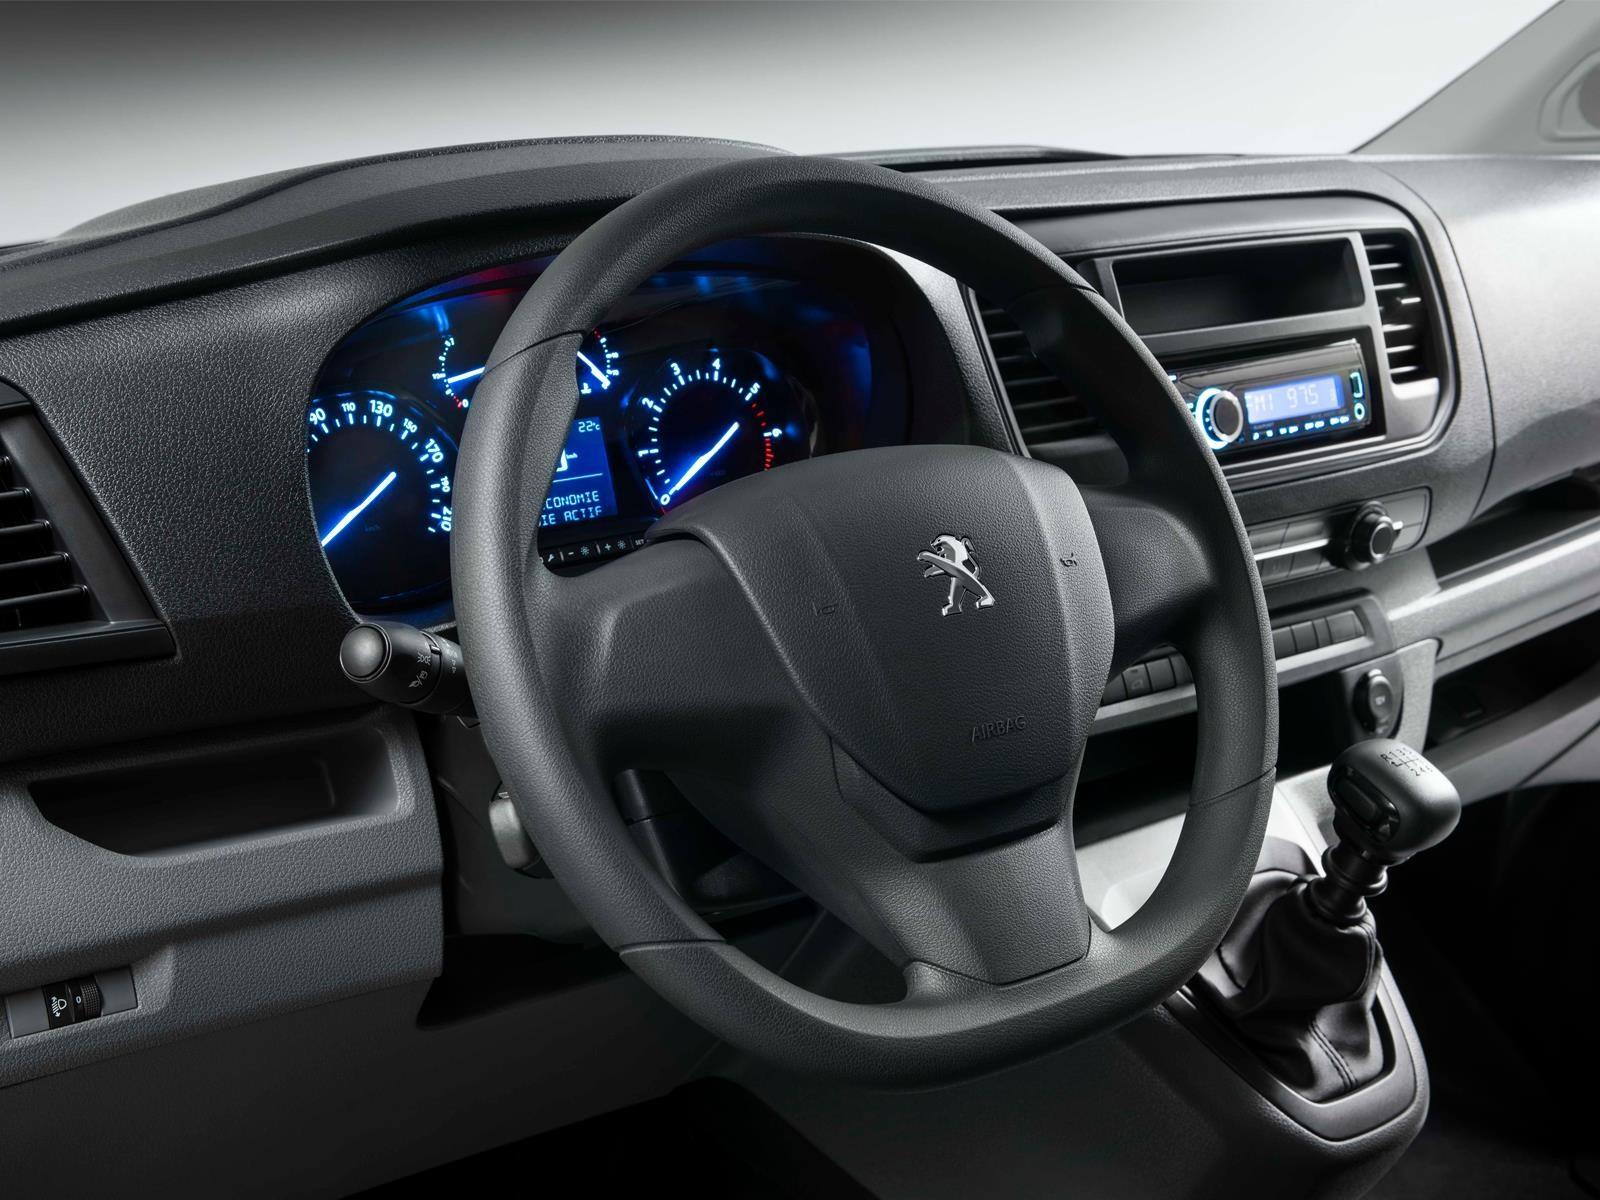 Peugeot Expert 2018 Llega A M 233 Xico Desde 420 900 Pesos Autocosmos Com